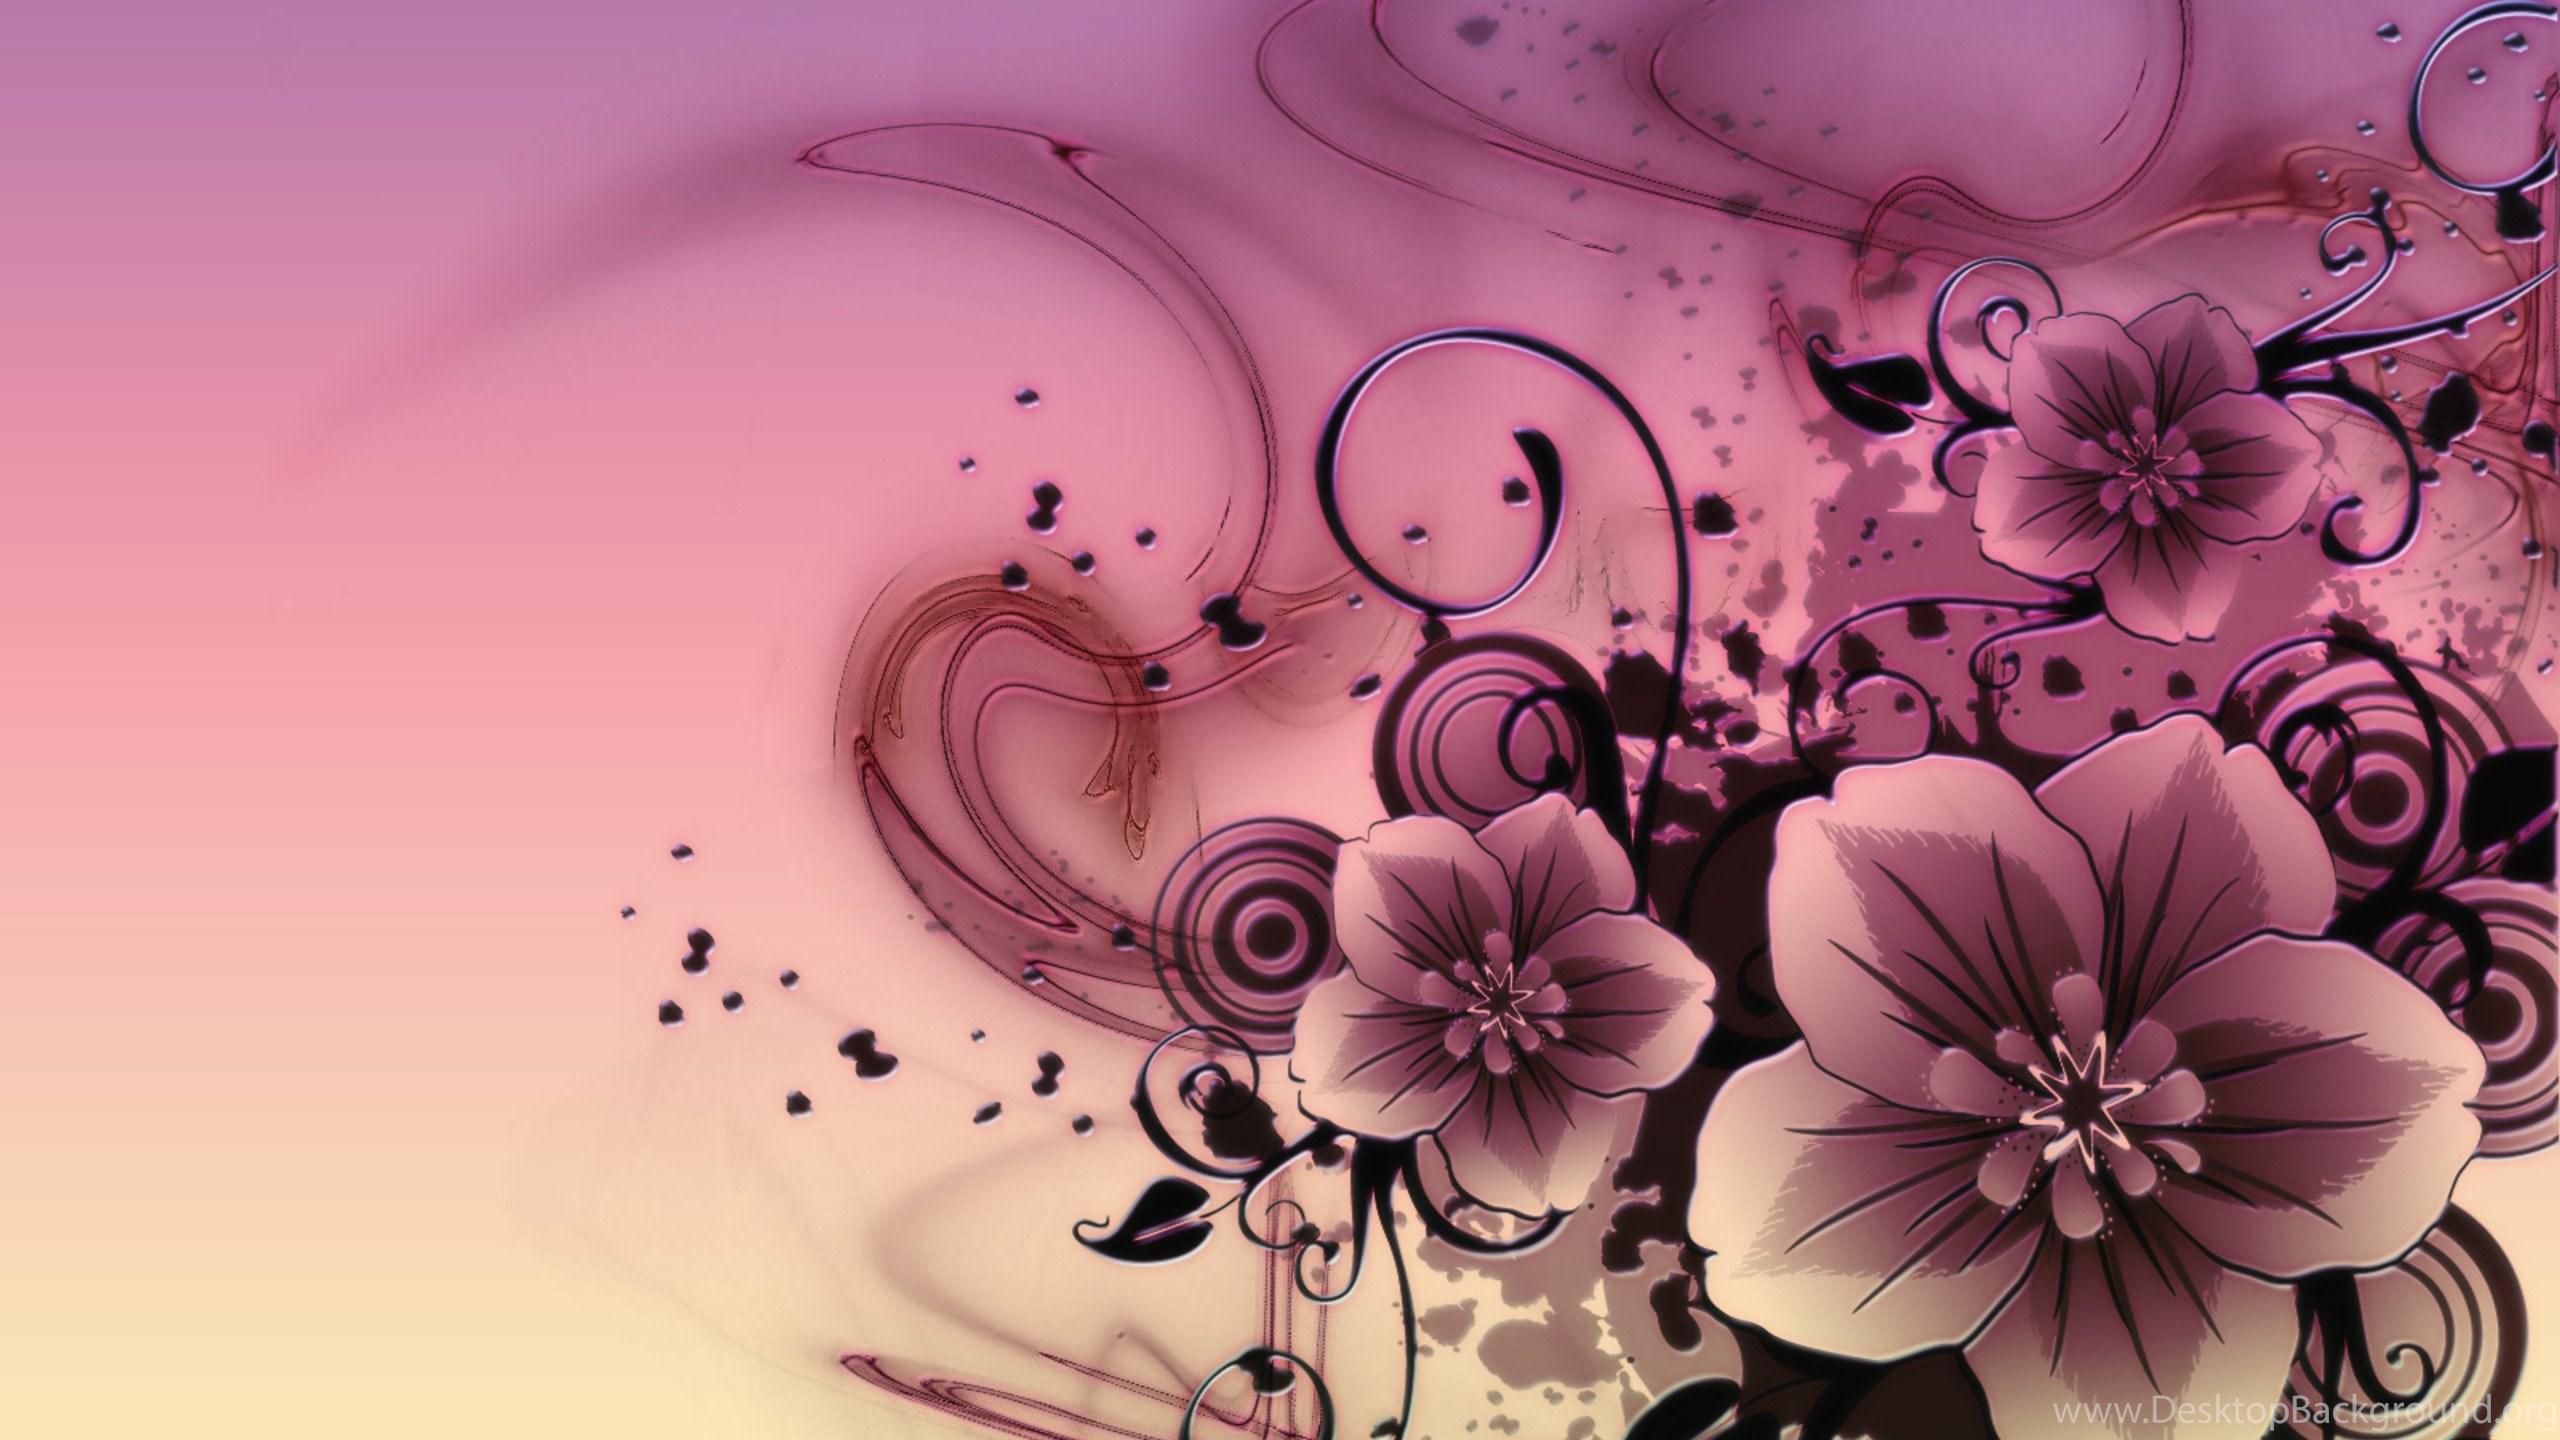 Amazing Wallpaper High Resolution Flower - 910563_high-resolution-flowers-wallpapers-zibrato_2560x1600_h  Collection_429177.jpg